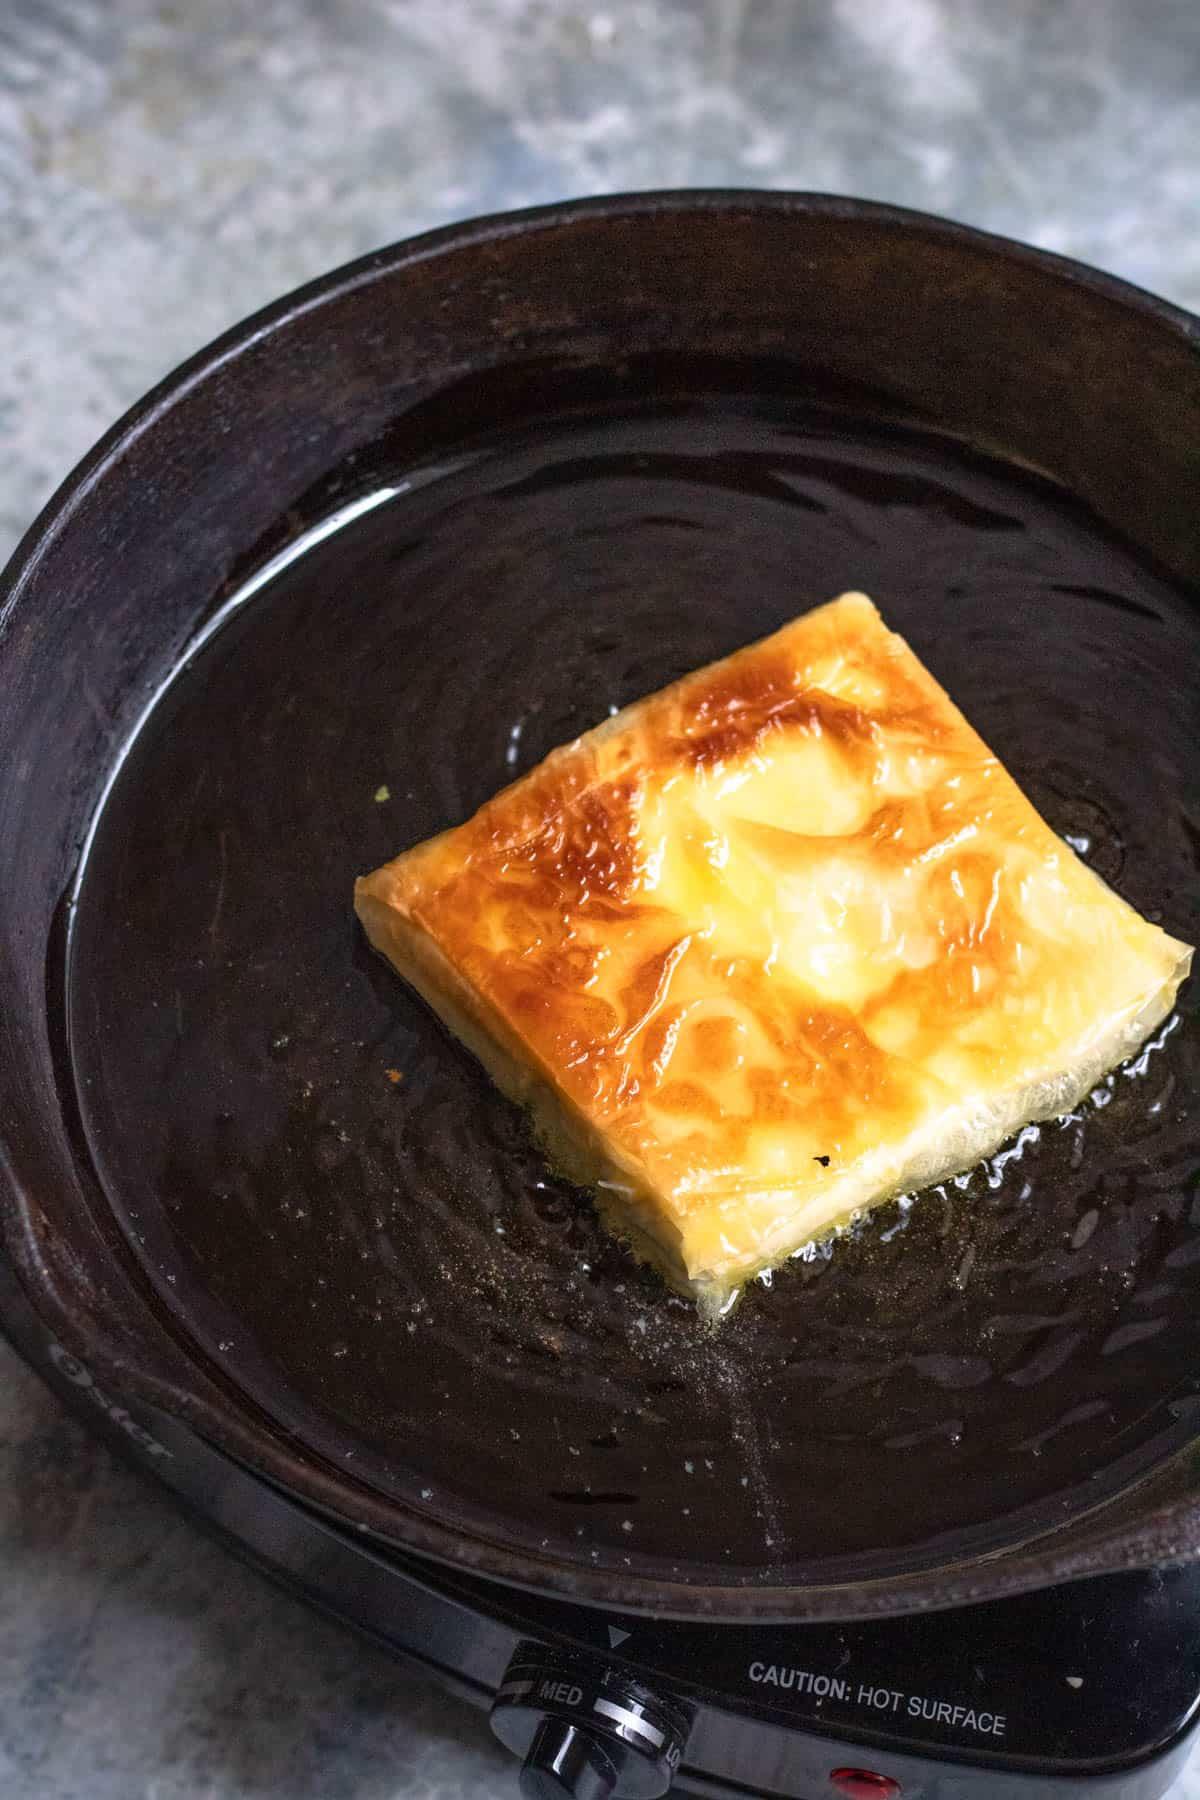 crispy feta cooking in a cast iron